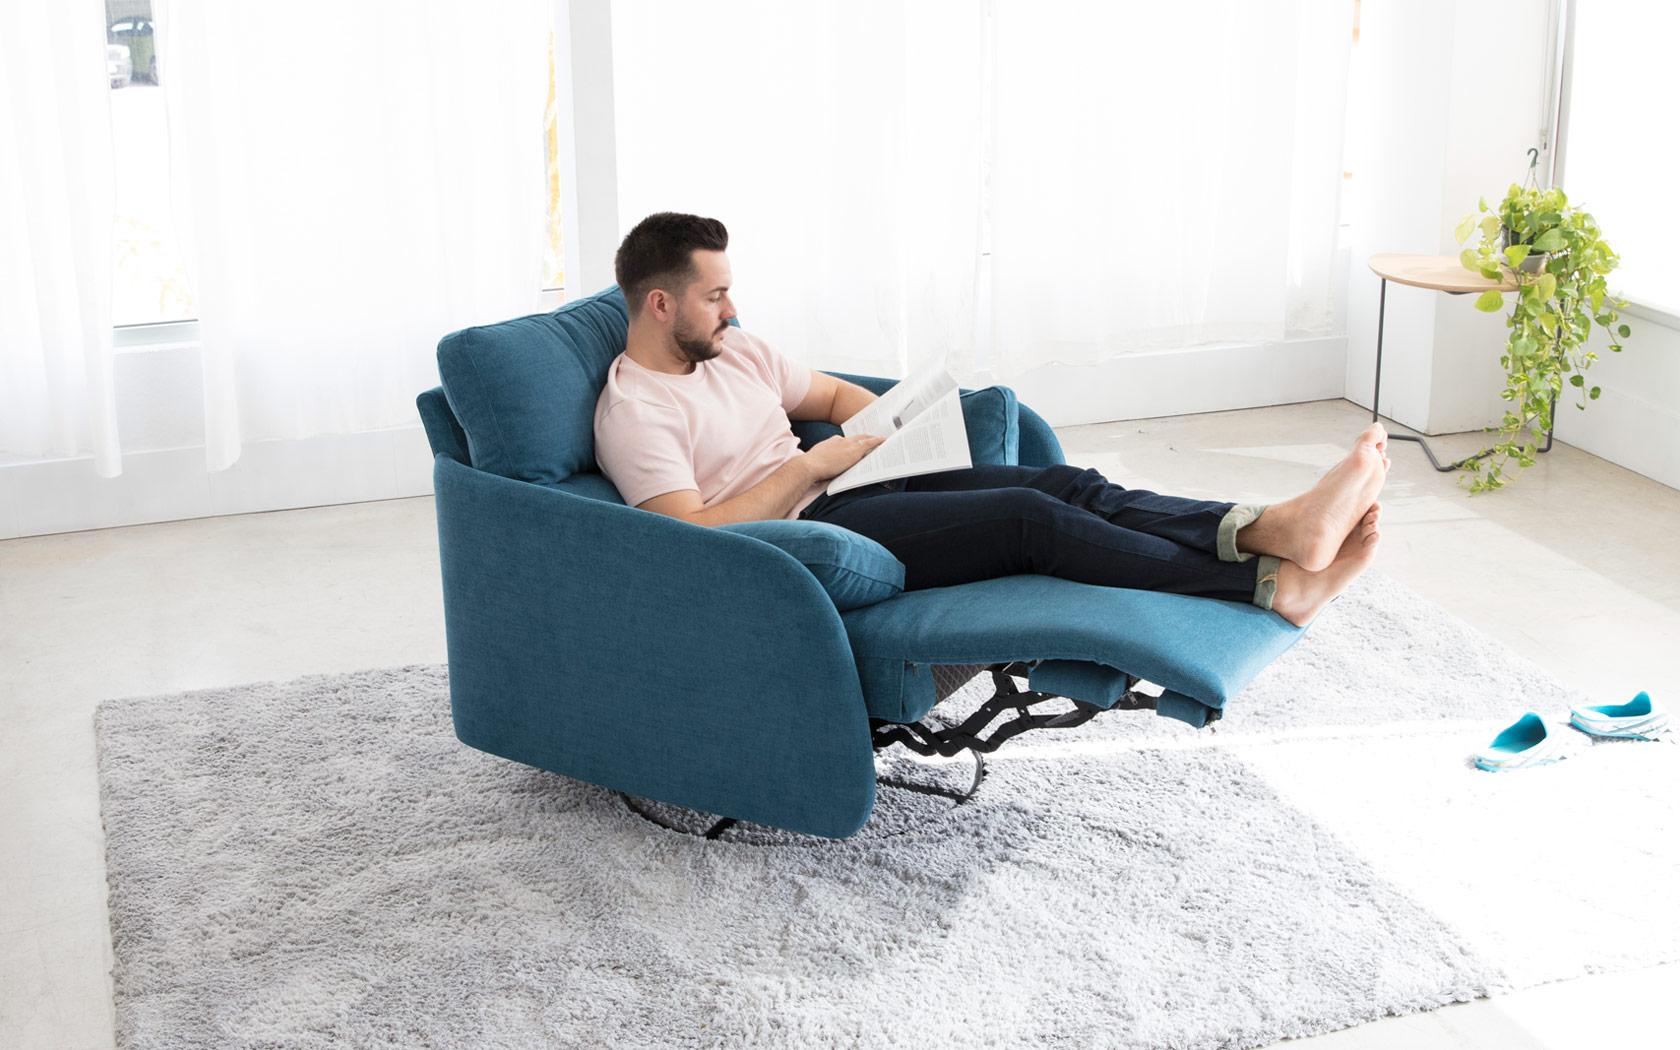 Adan sillon relax 2020 02